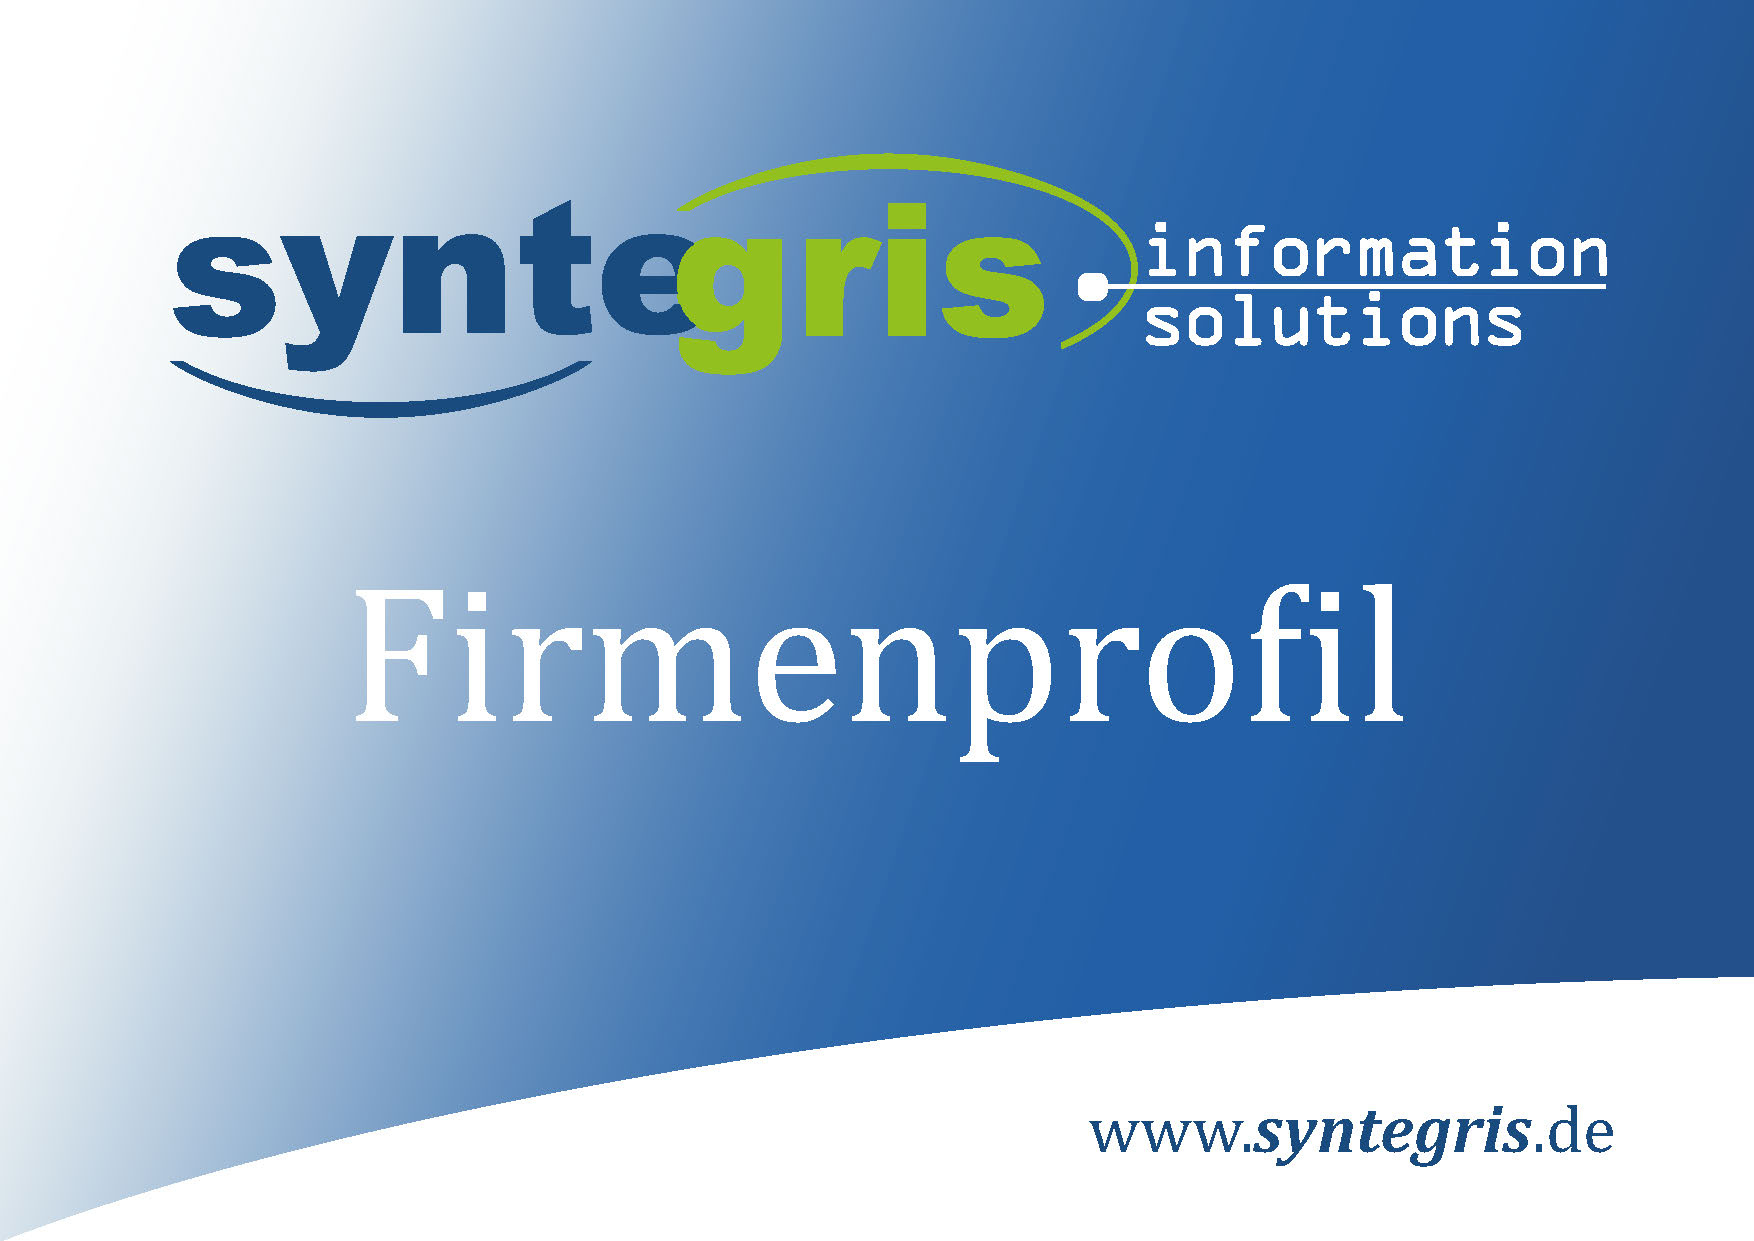 Syntegris Firmenprofil